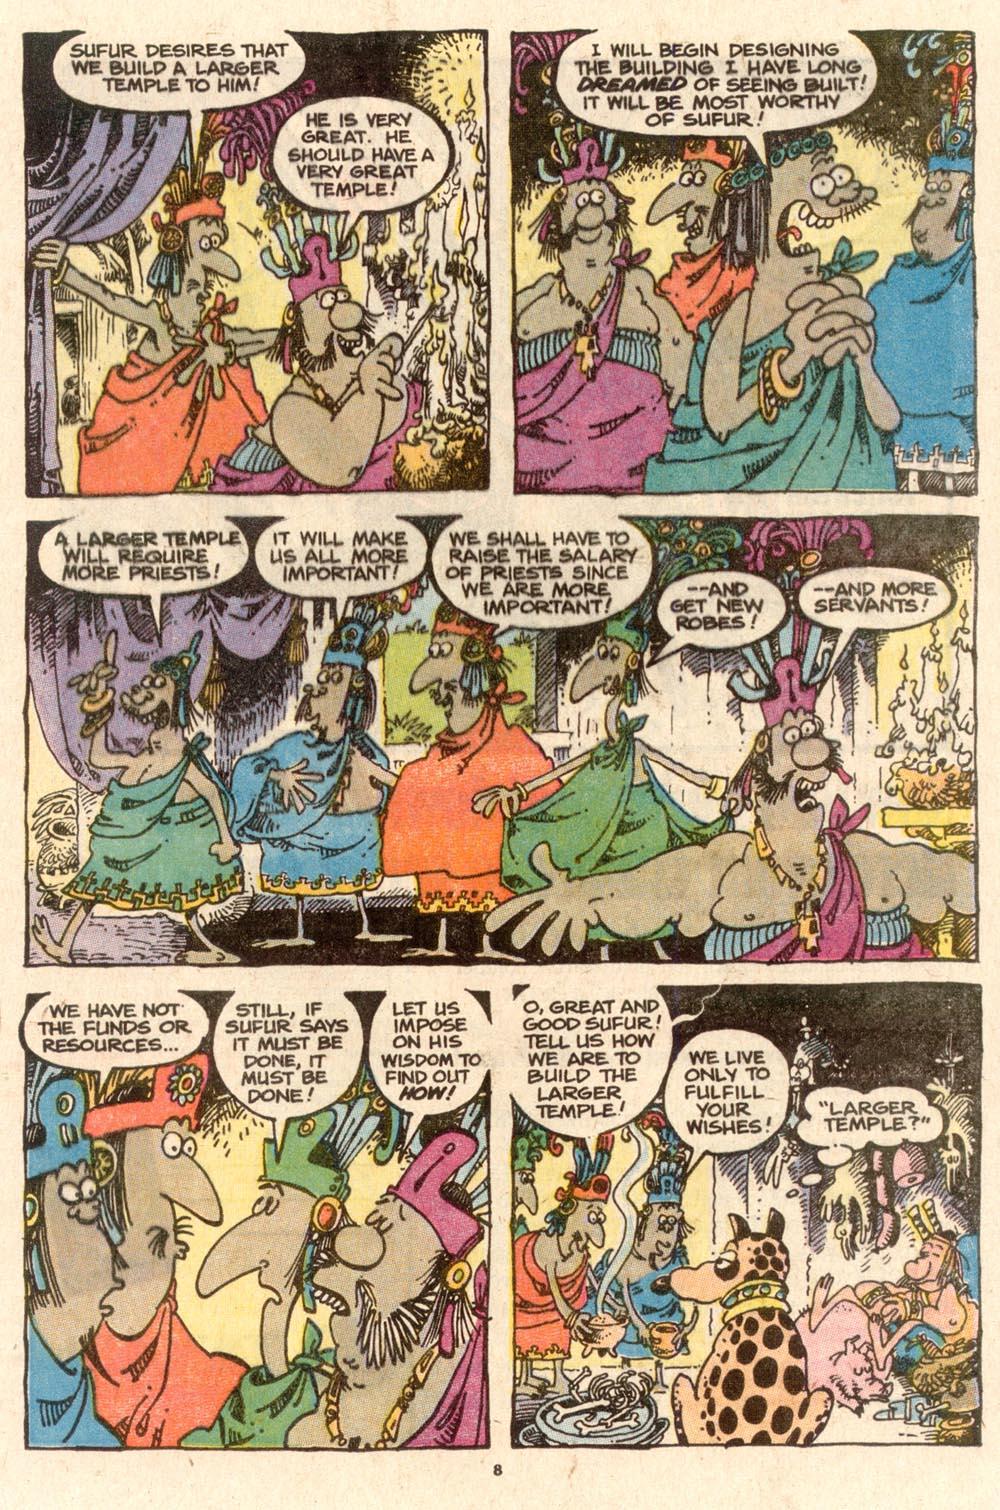 Read online Sergio Aragonés Groo the Wanderer comic -  Issue #58 - 8